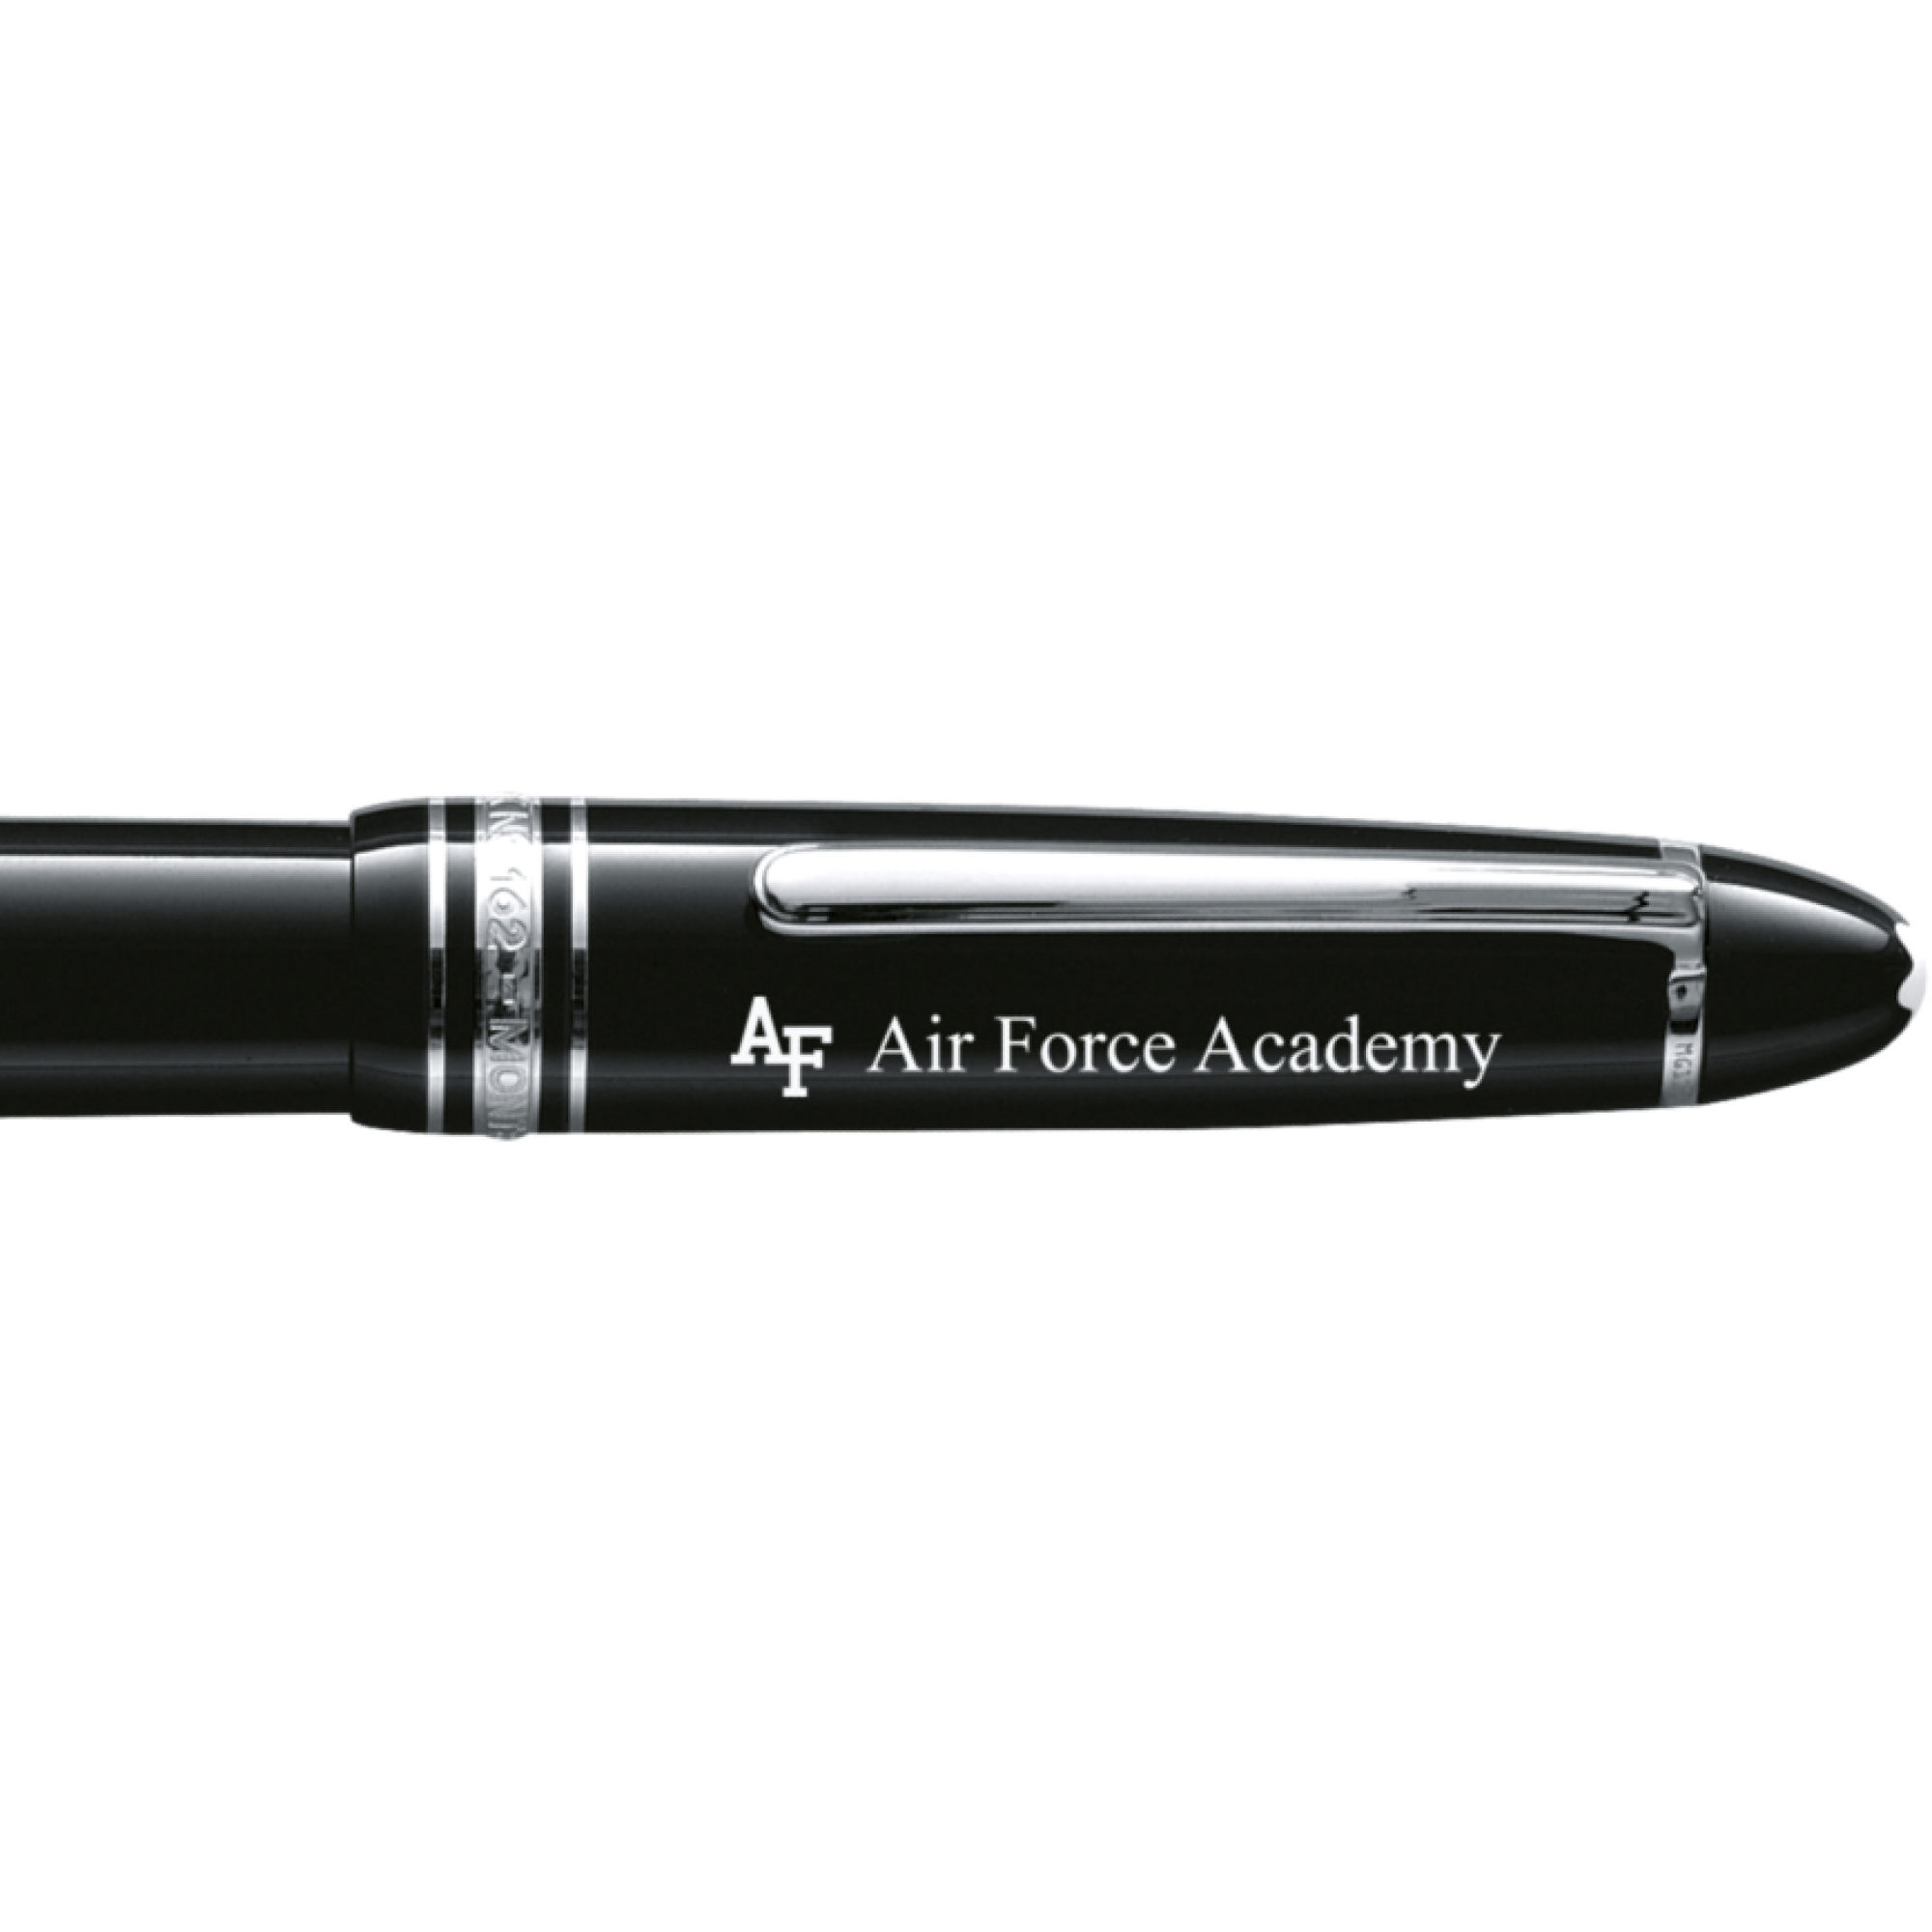 US Air Force Academy Montblanc Meisterstück LeGrand Rollerball Pen in Platinum